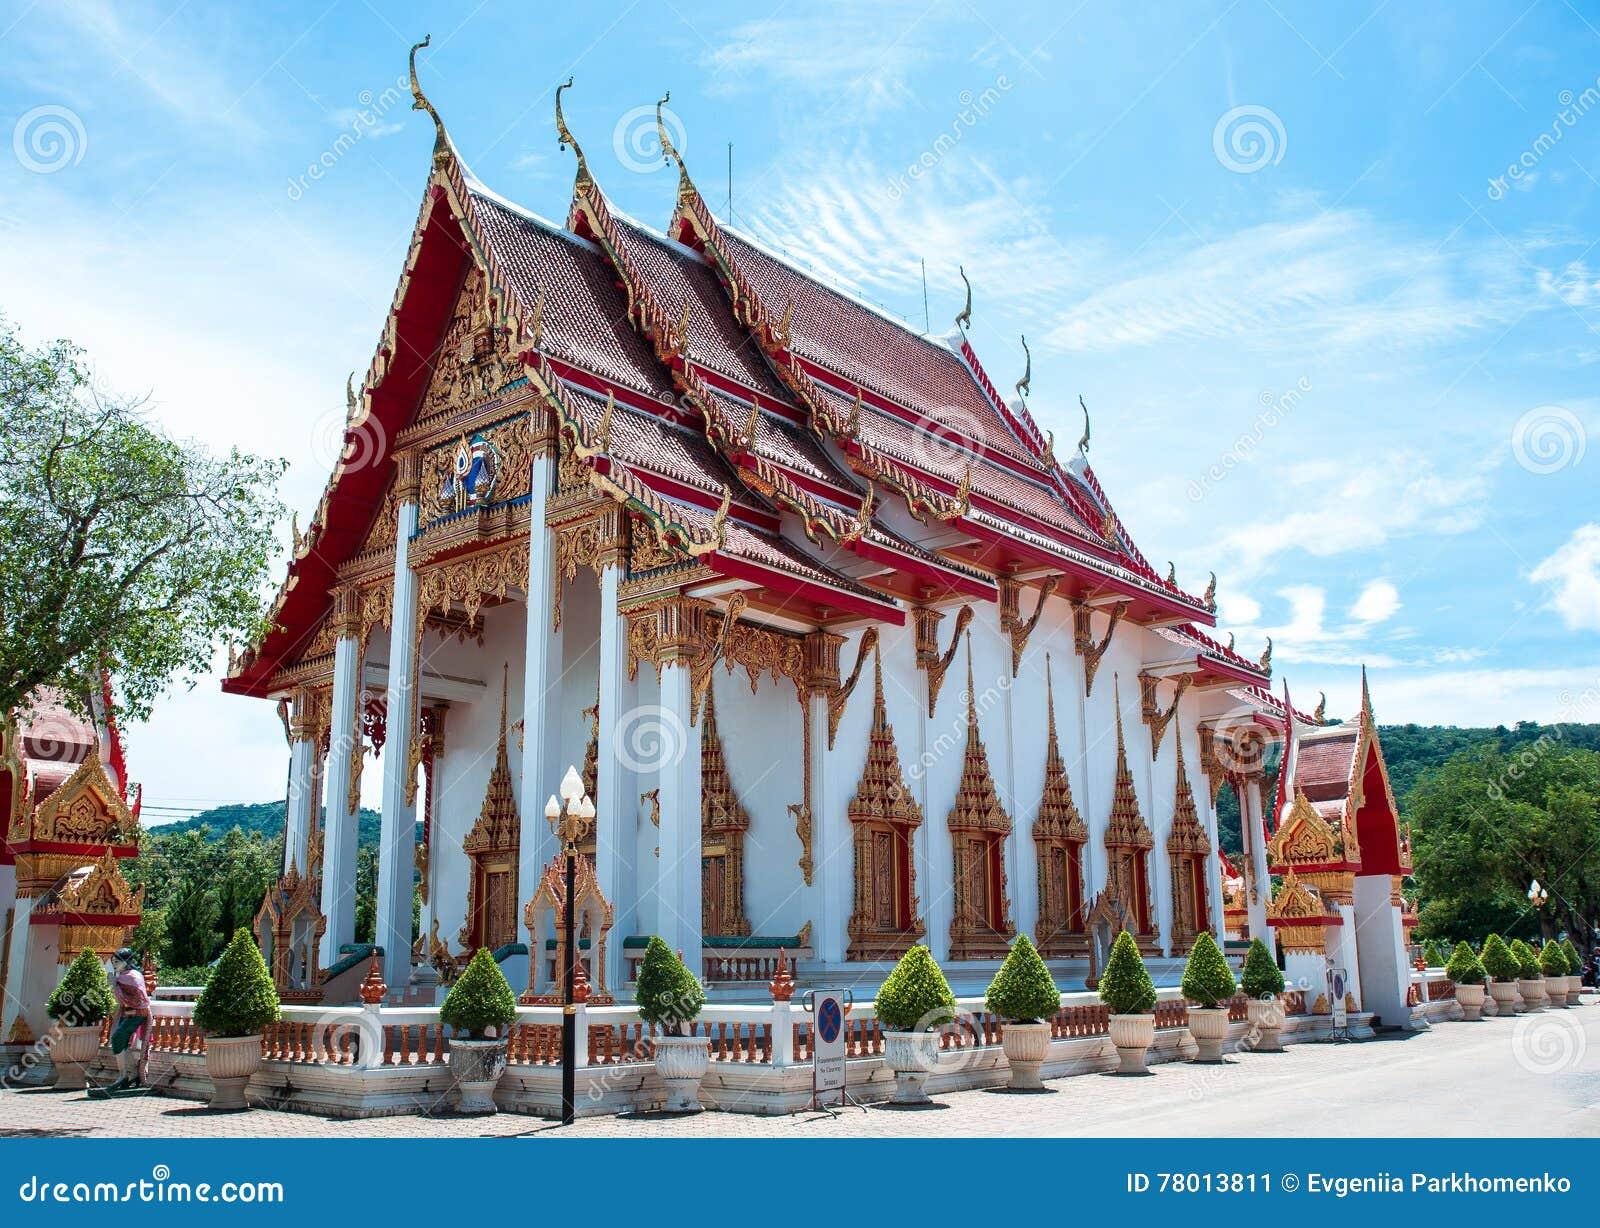 Wat查龙寺庙复合体在普吉岛,泰国